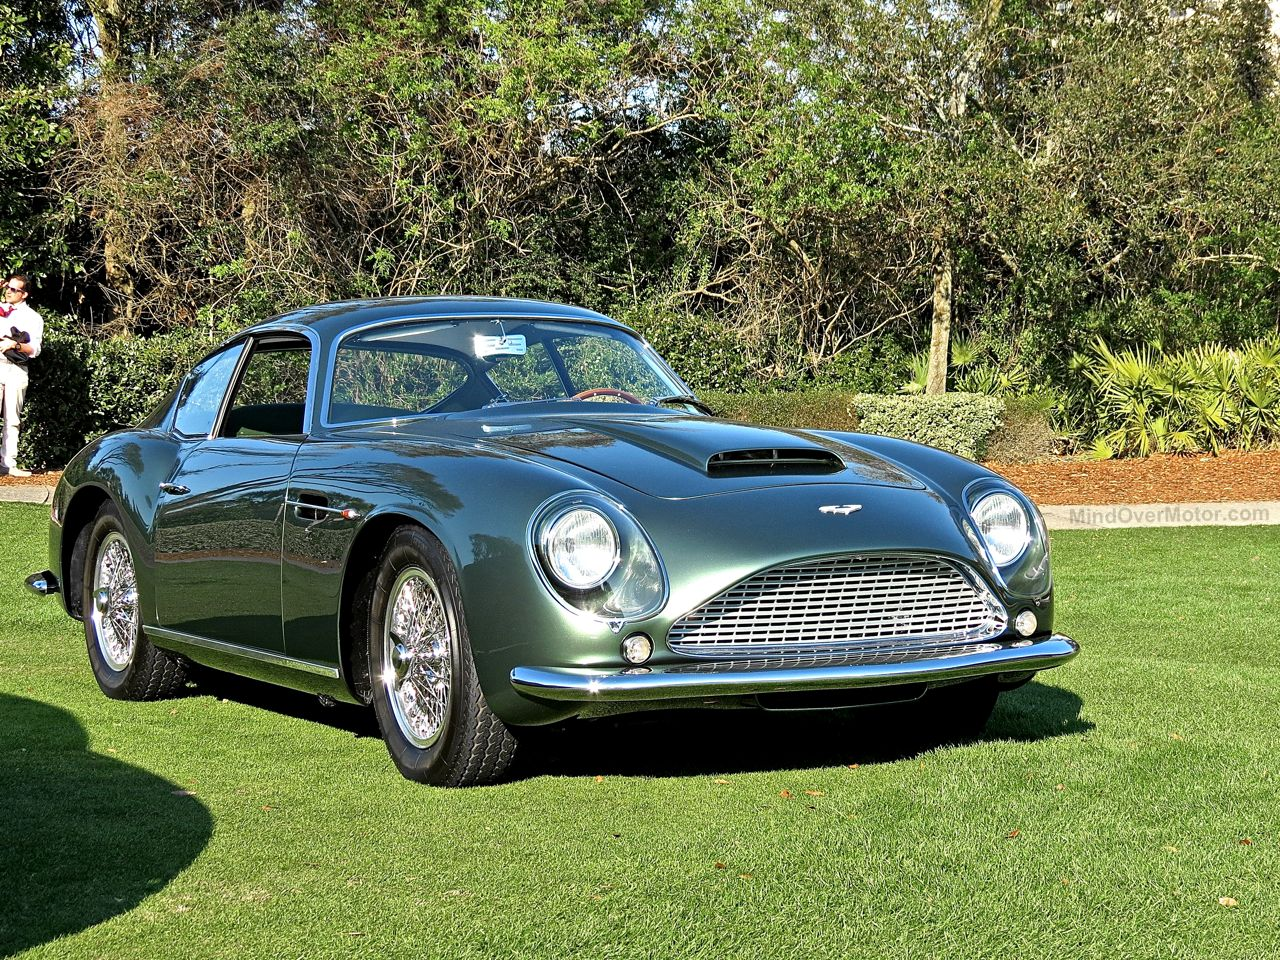 Aston Martin DB4 GT Zagato Amelia Island 1